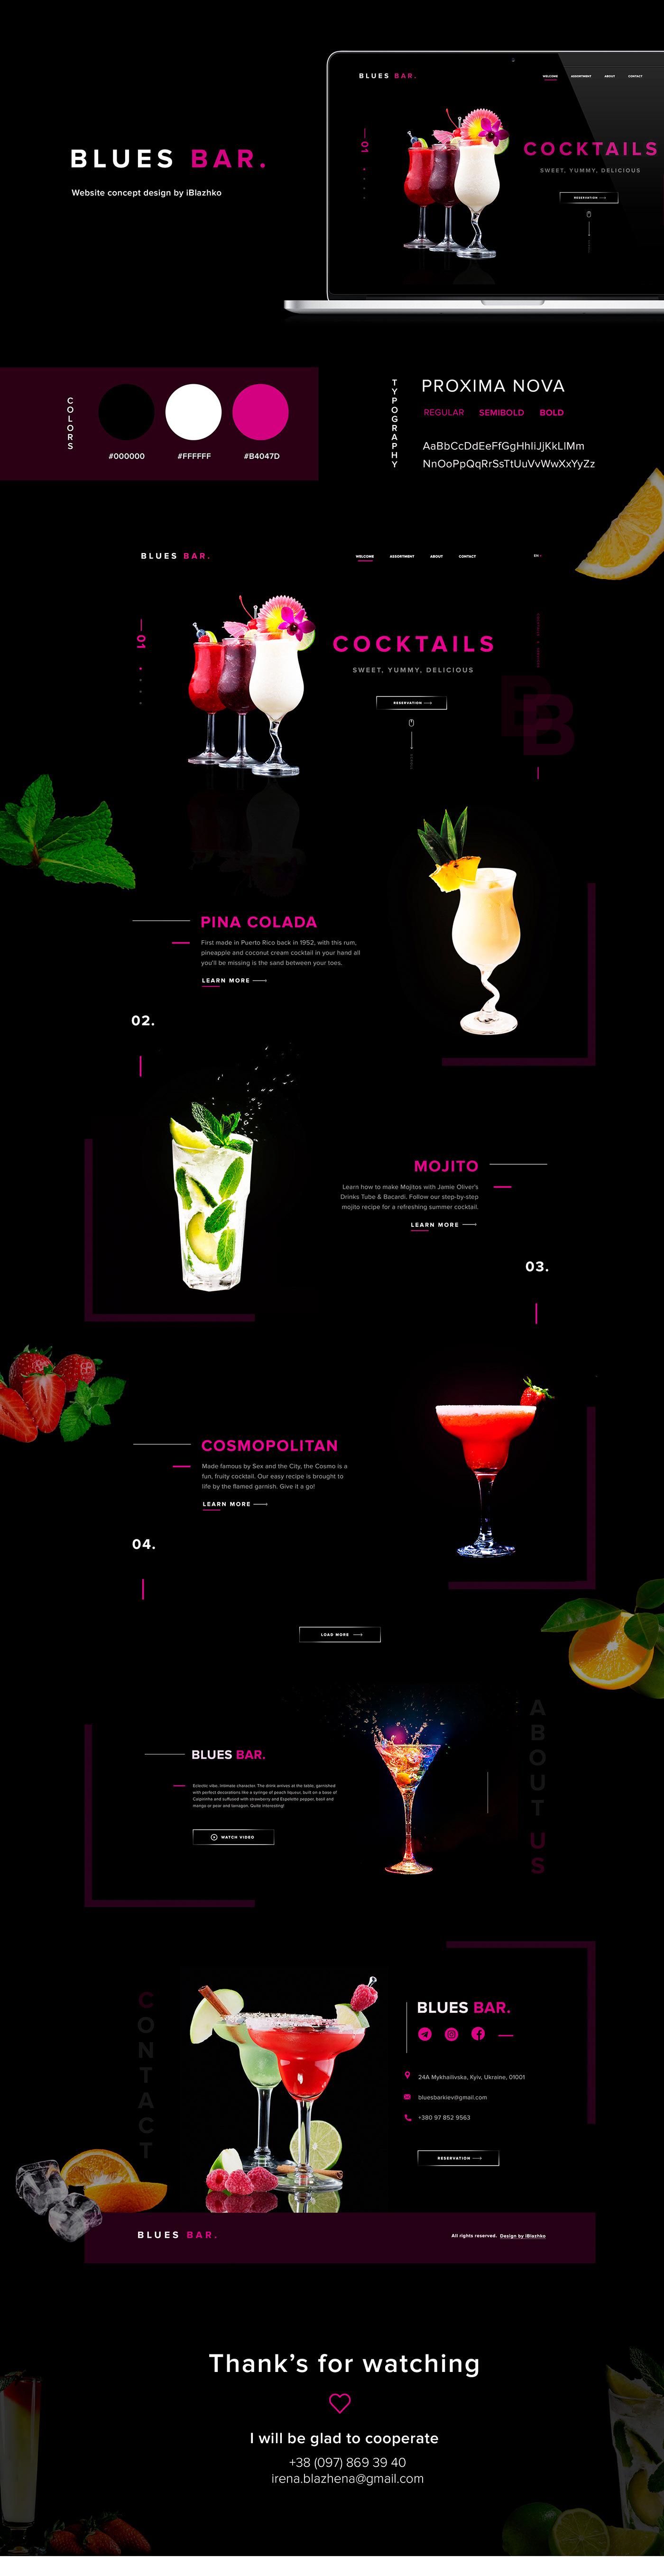 bar cocktails design restaurant Website веб-дизайн дизайн минимализм темный дизайн чёрный дизайн